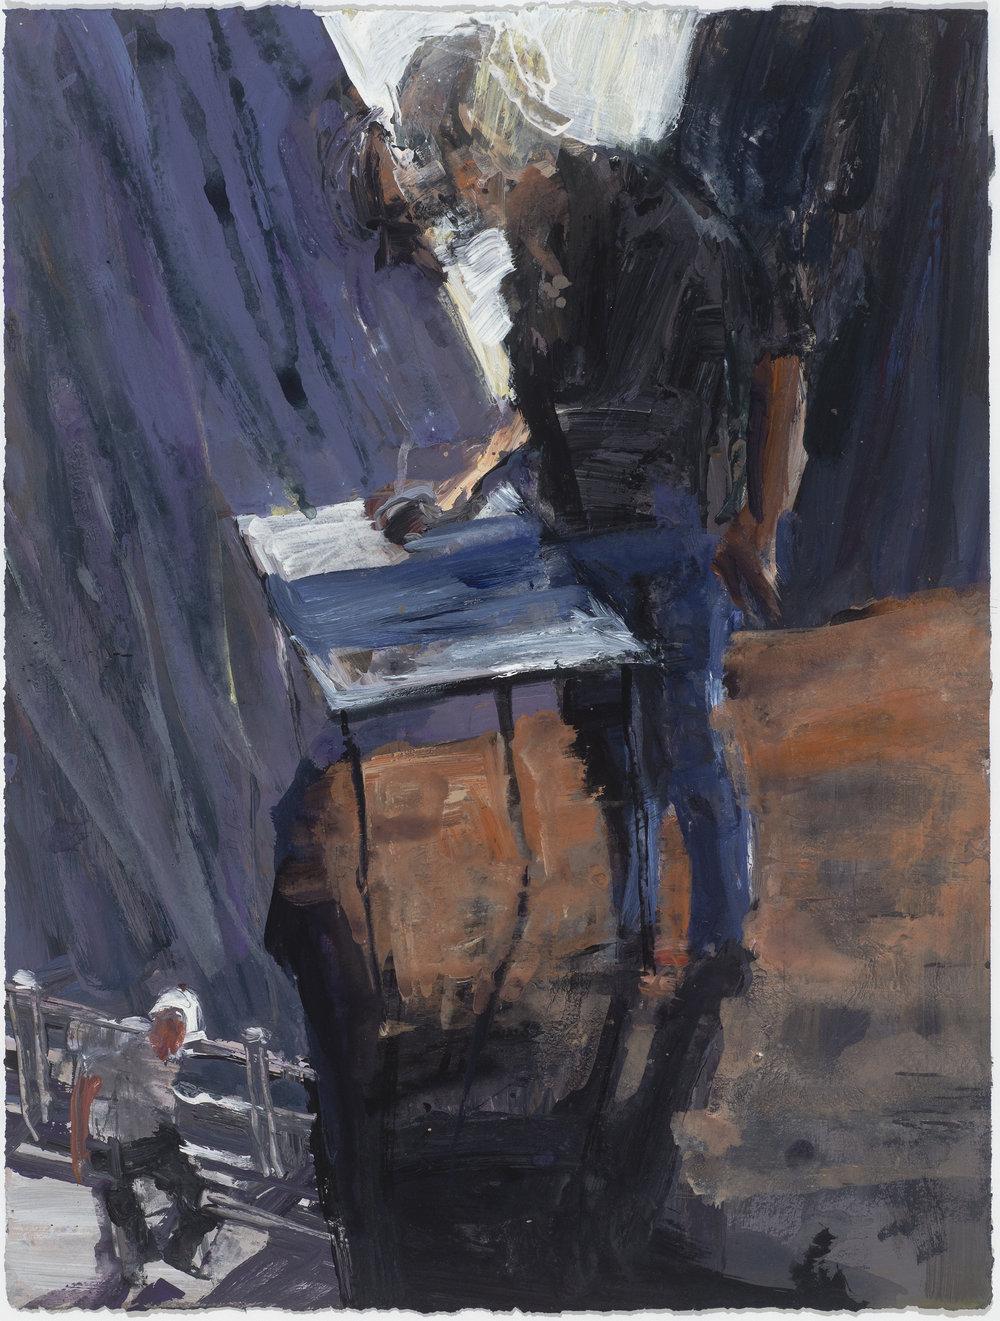 Painter Study YM  畫家考察黃山   Euan Macleod , 2016  Acrylic on paper, 66 x 50 cm, HKD 19,300 framed